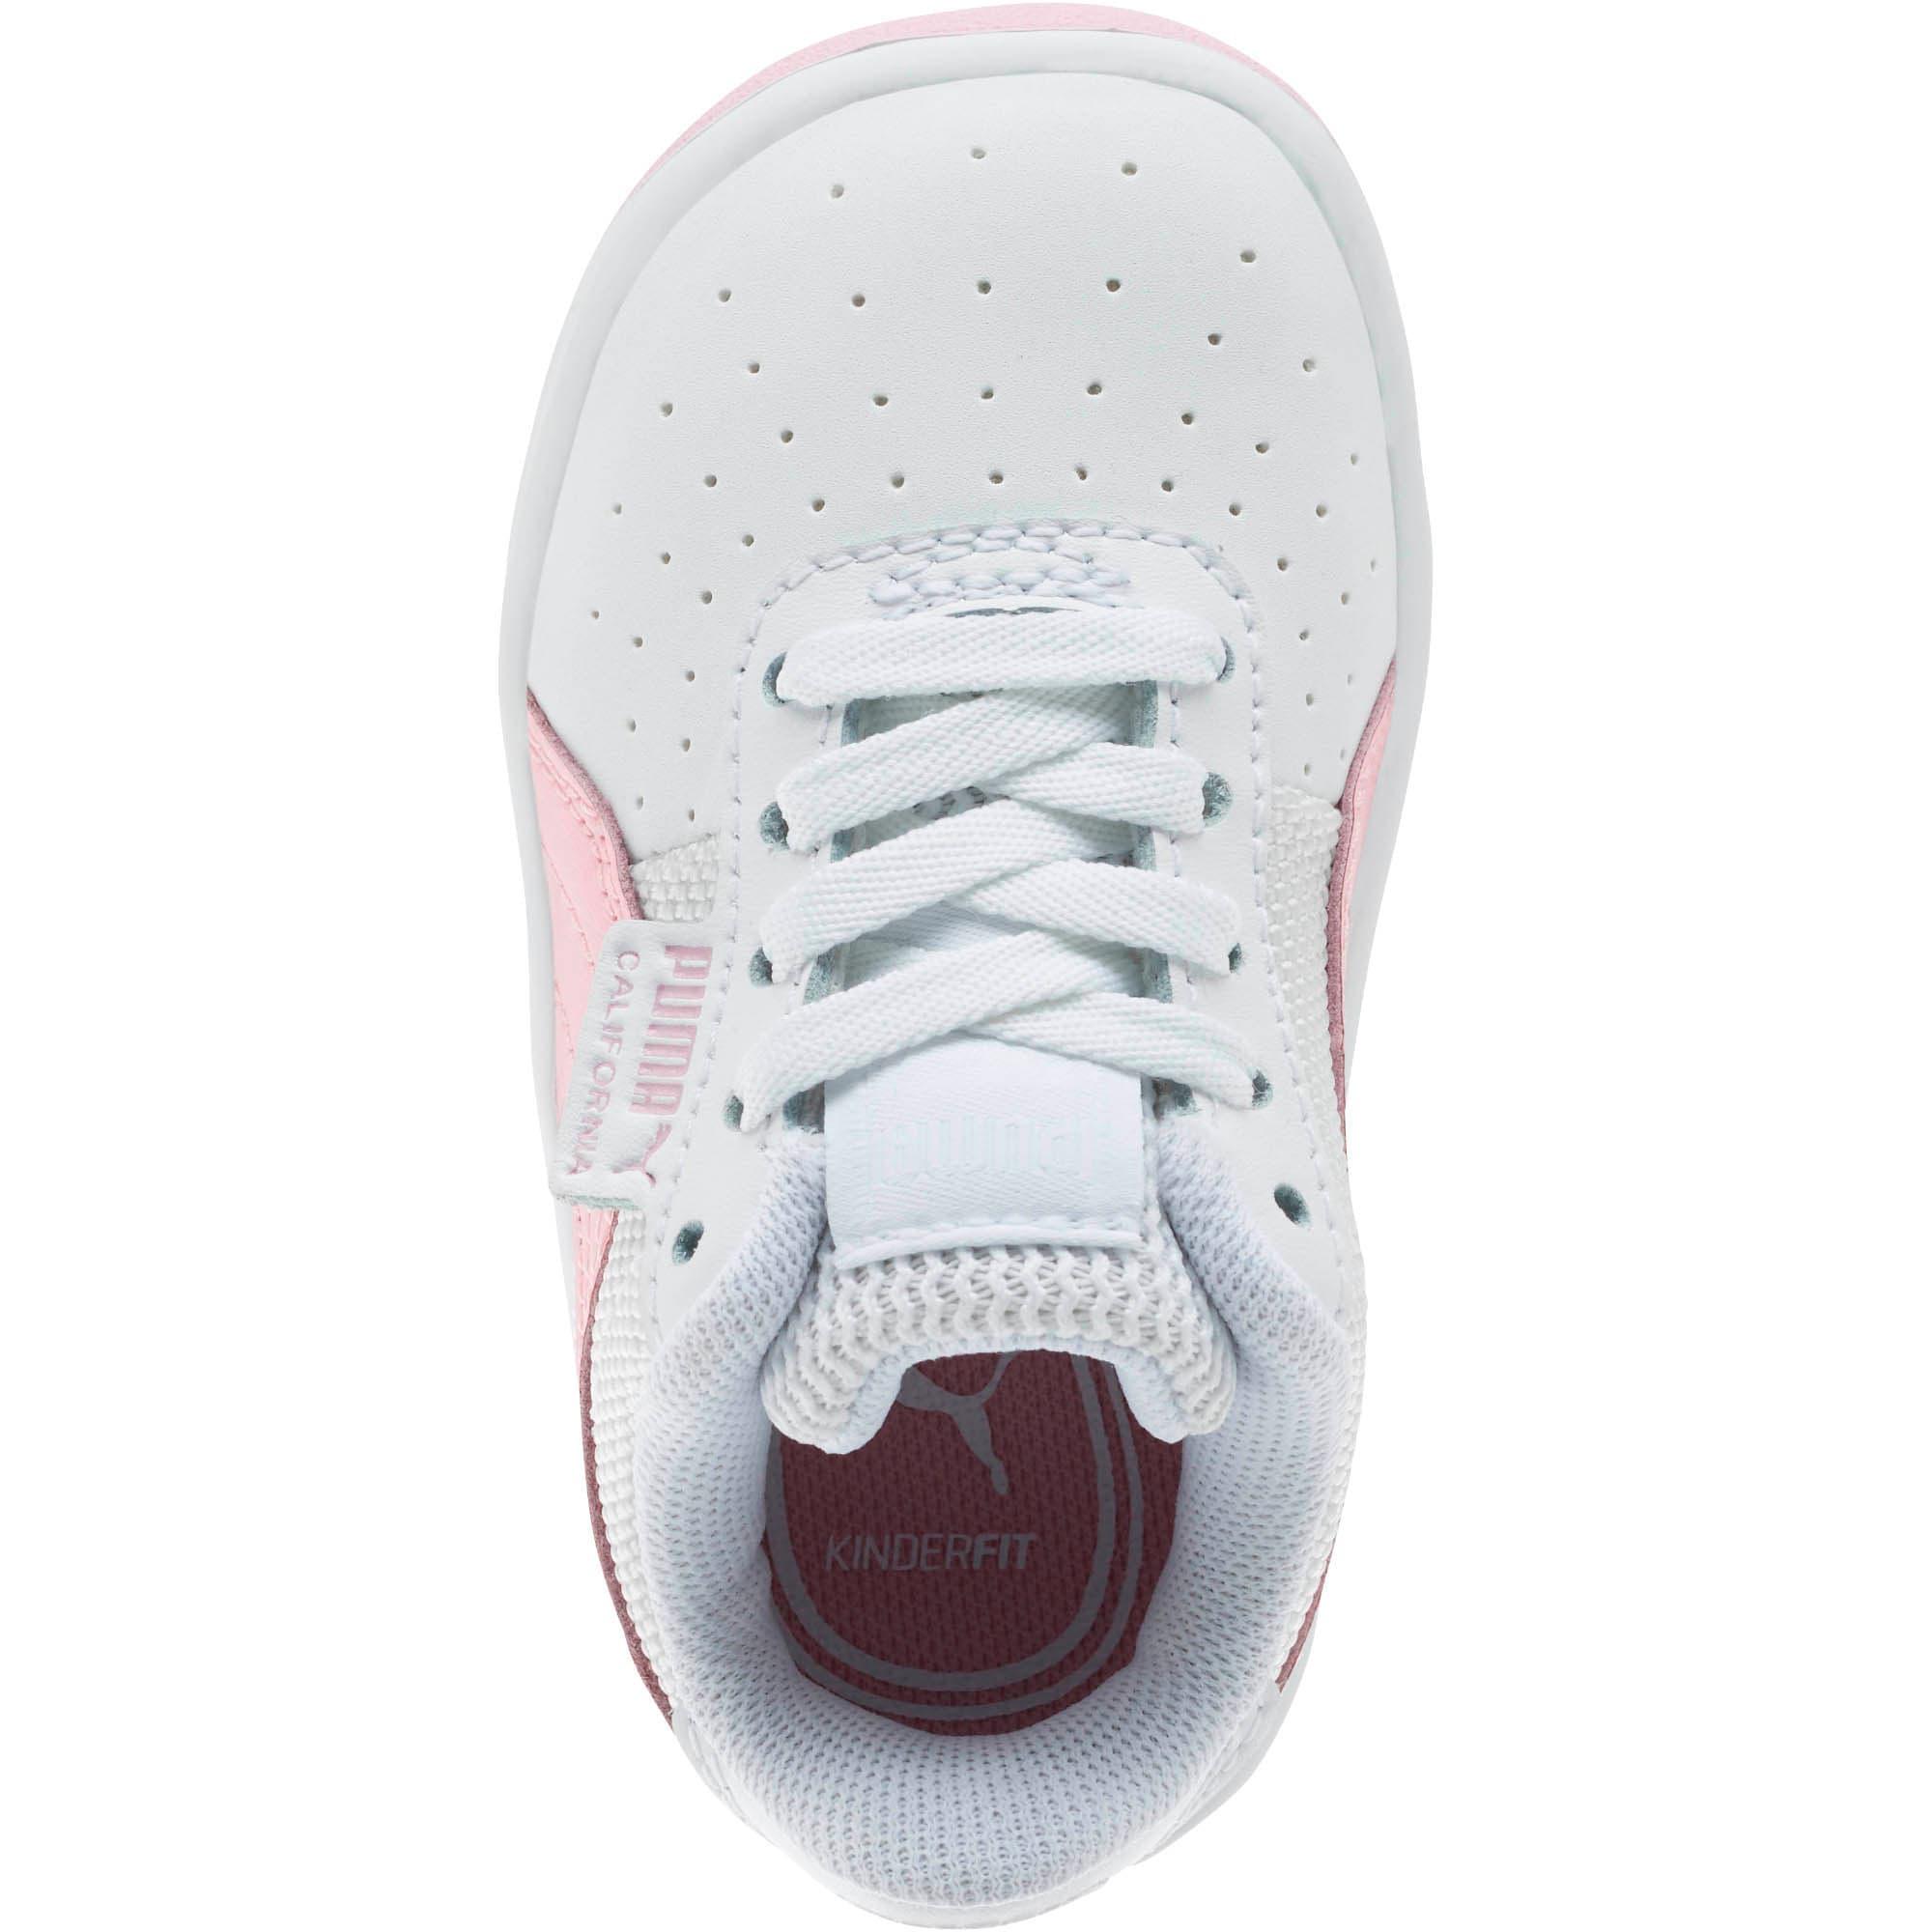 Thumbnail 5 of California Toddler Shoes, Puma Wht-Pale Pink-Puma Wht, medium